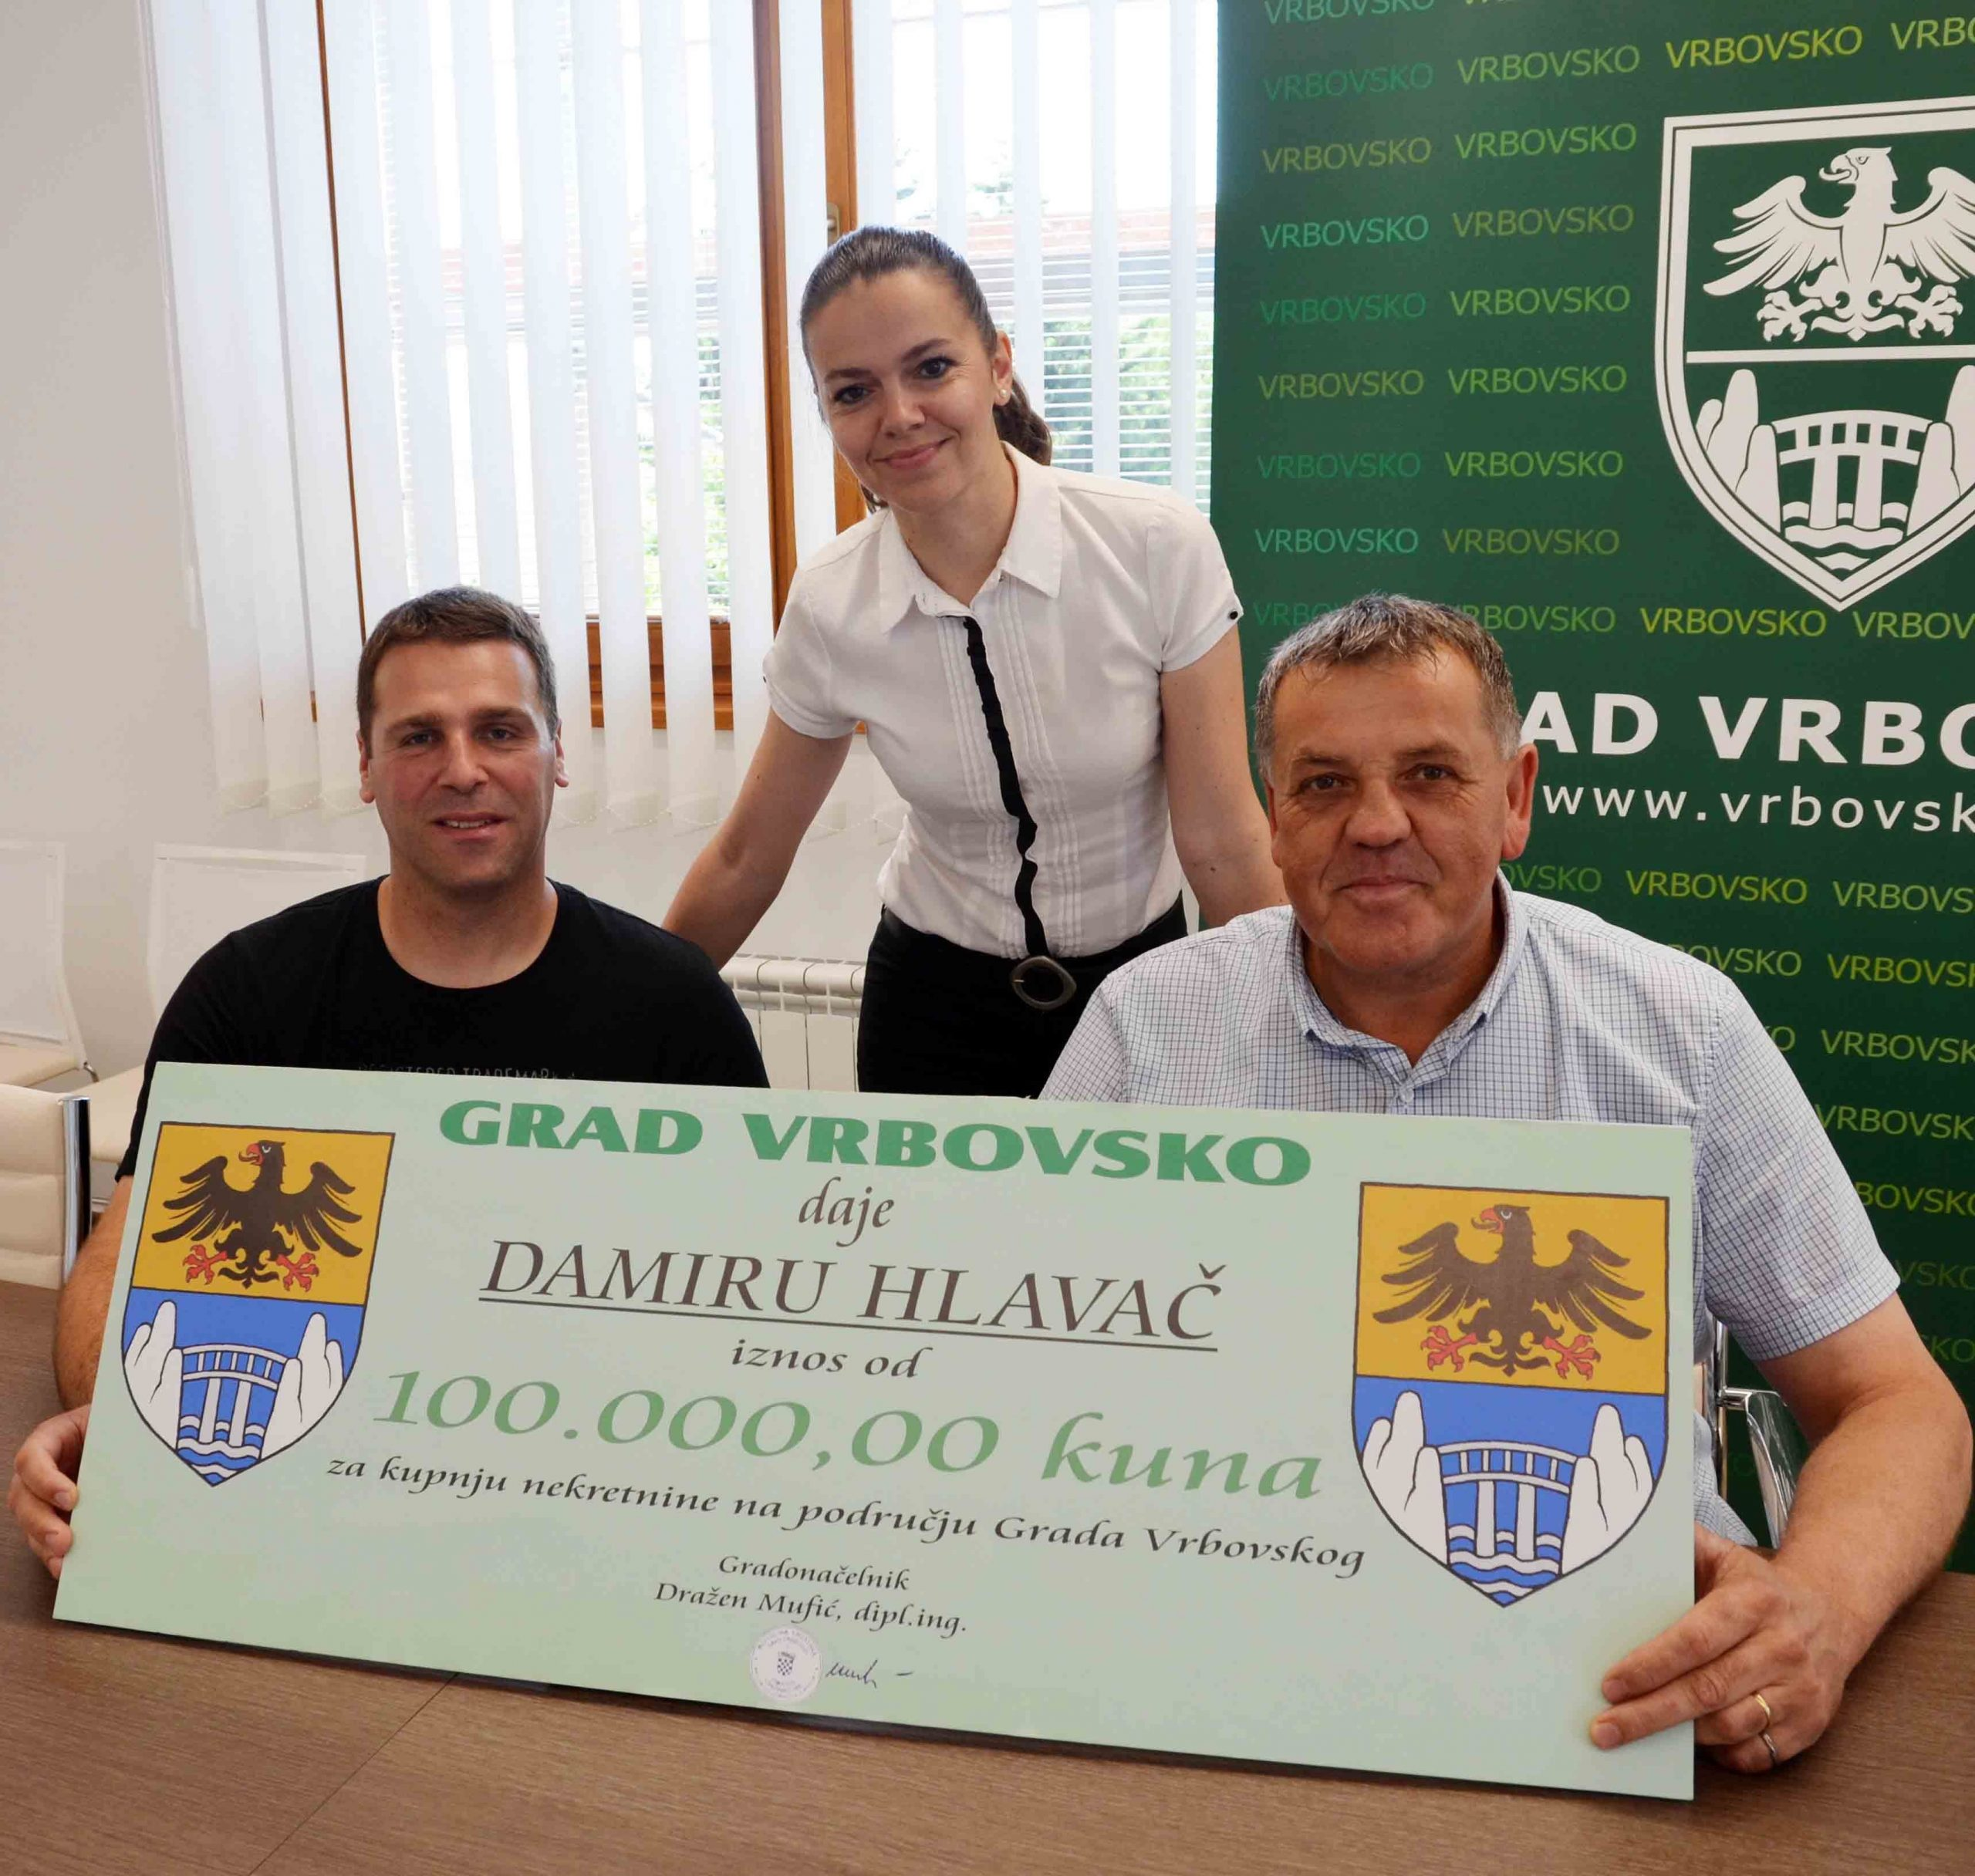 Foto M. Trinajstić